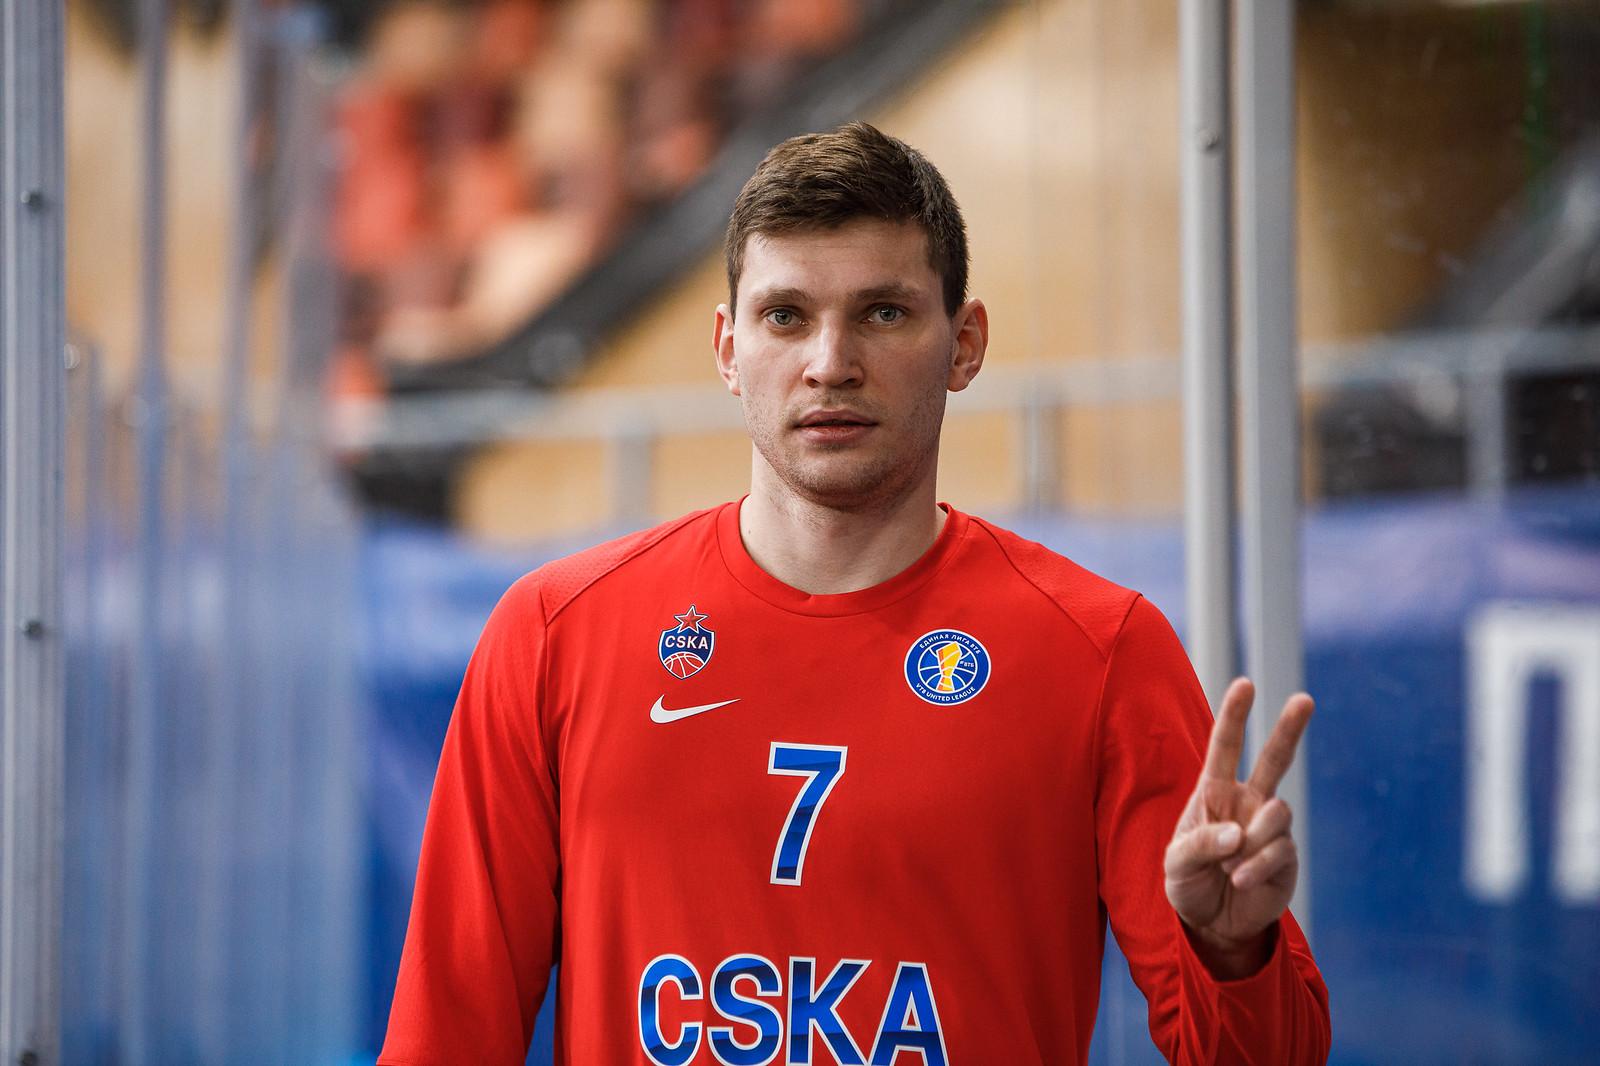 22/11/2020 PARMA-CSKA 61:95